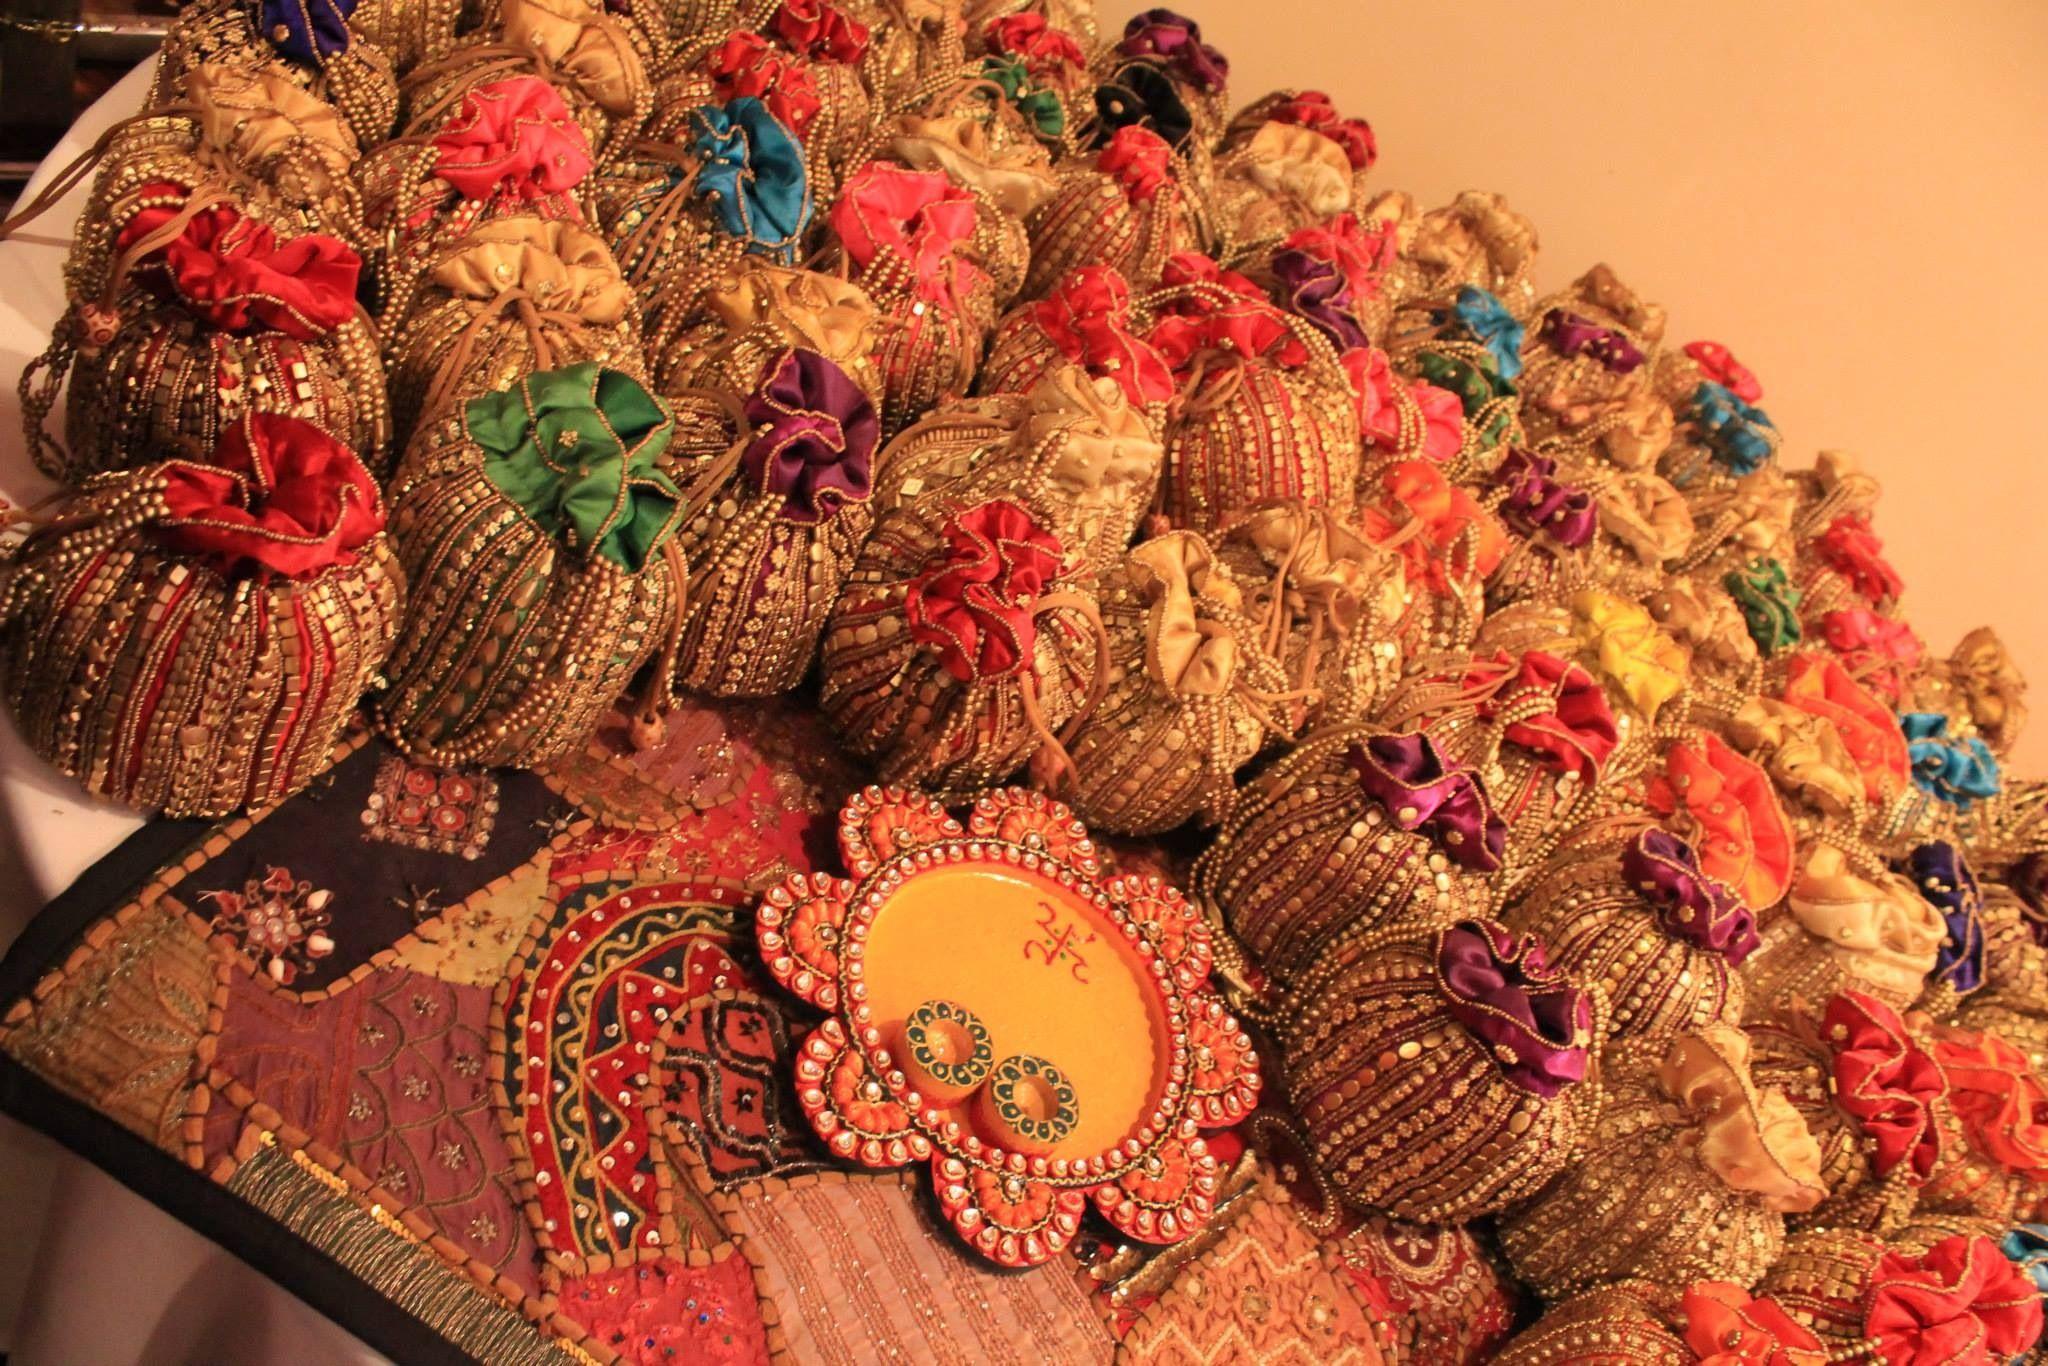 Indian wedding, Sangeet, mehendi, favors, sweet bags